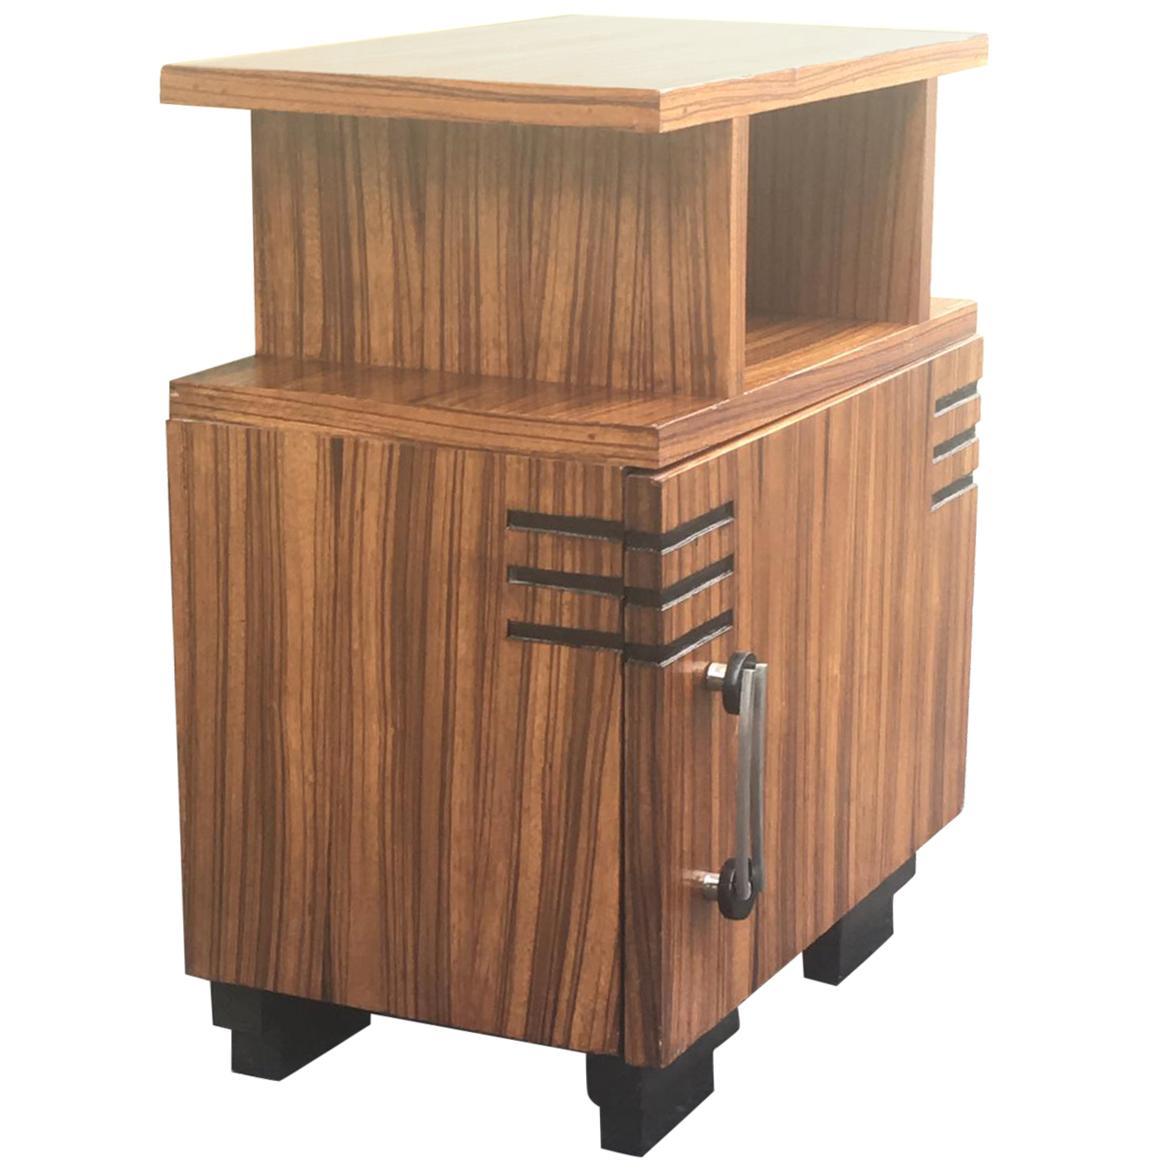 1920 art deco bedroom furniture ekenasfiber johnhenriksson se u2022 rh ekenasfiber johnhenriksson se